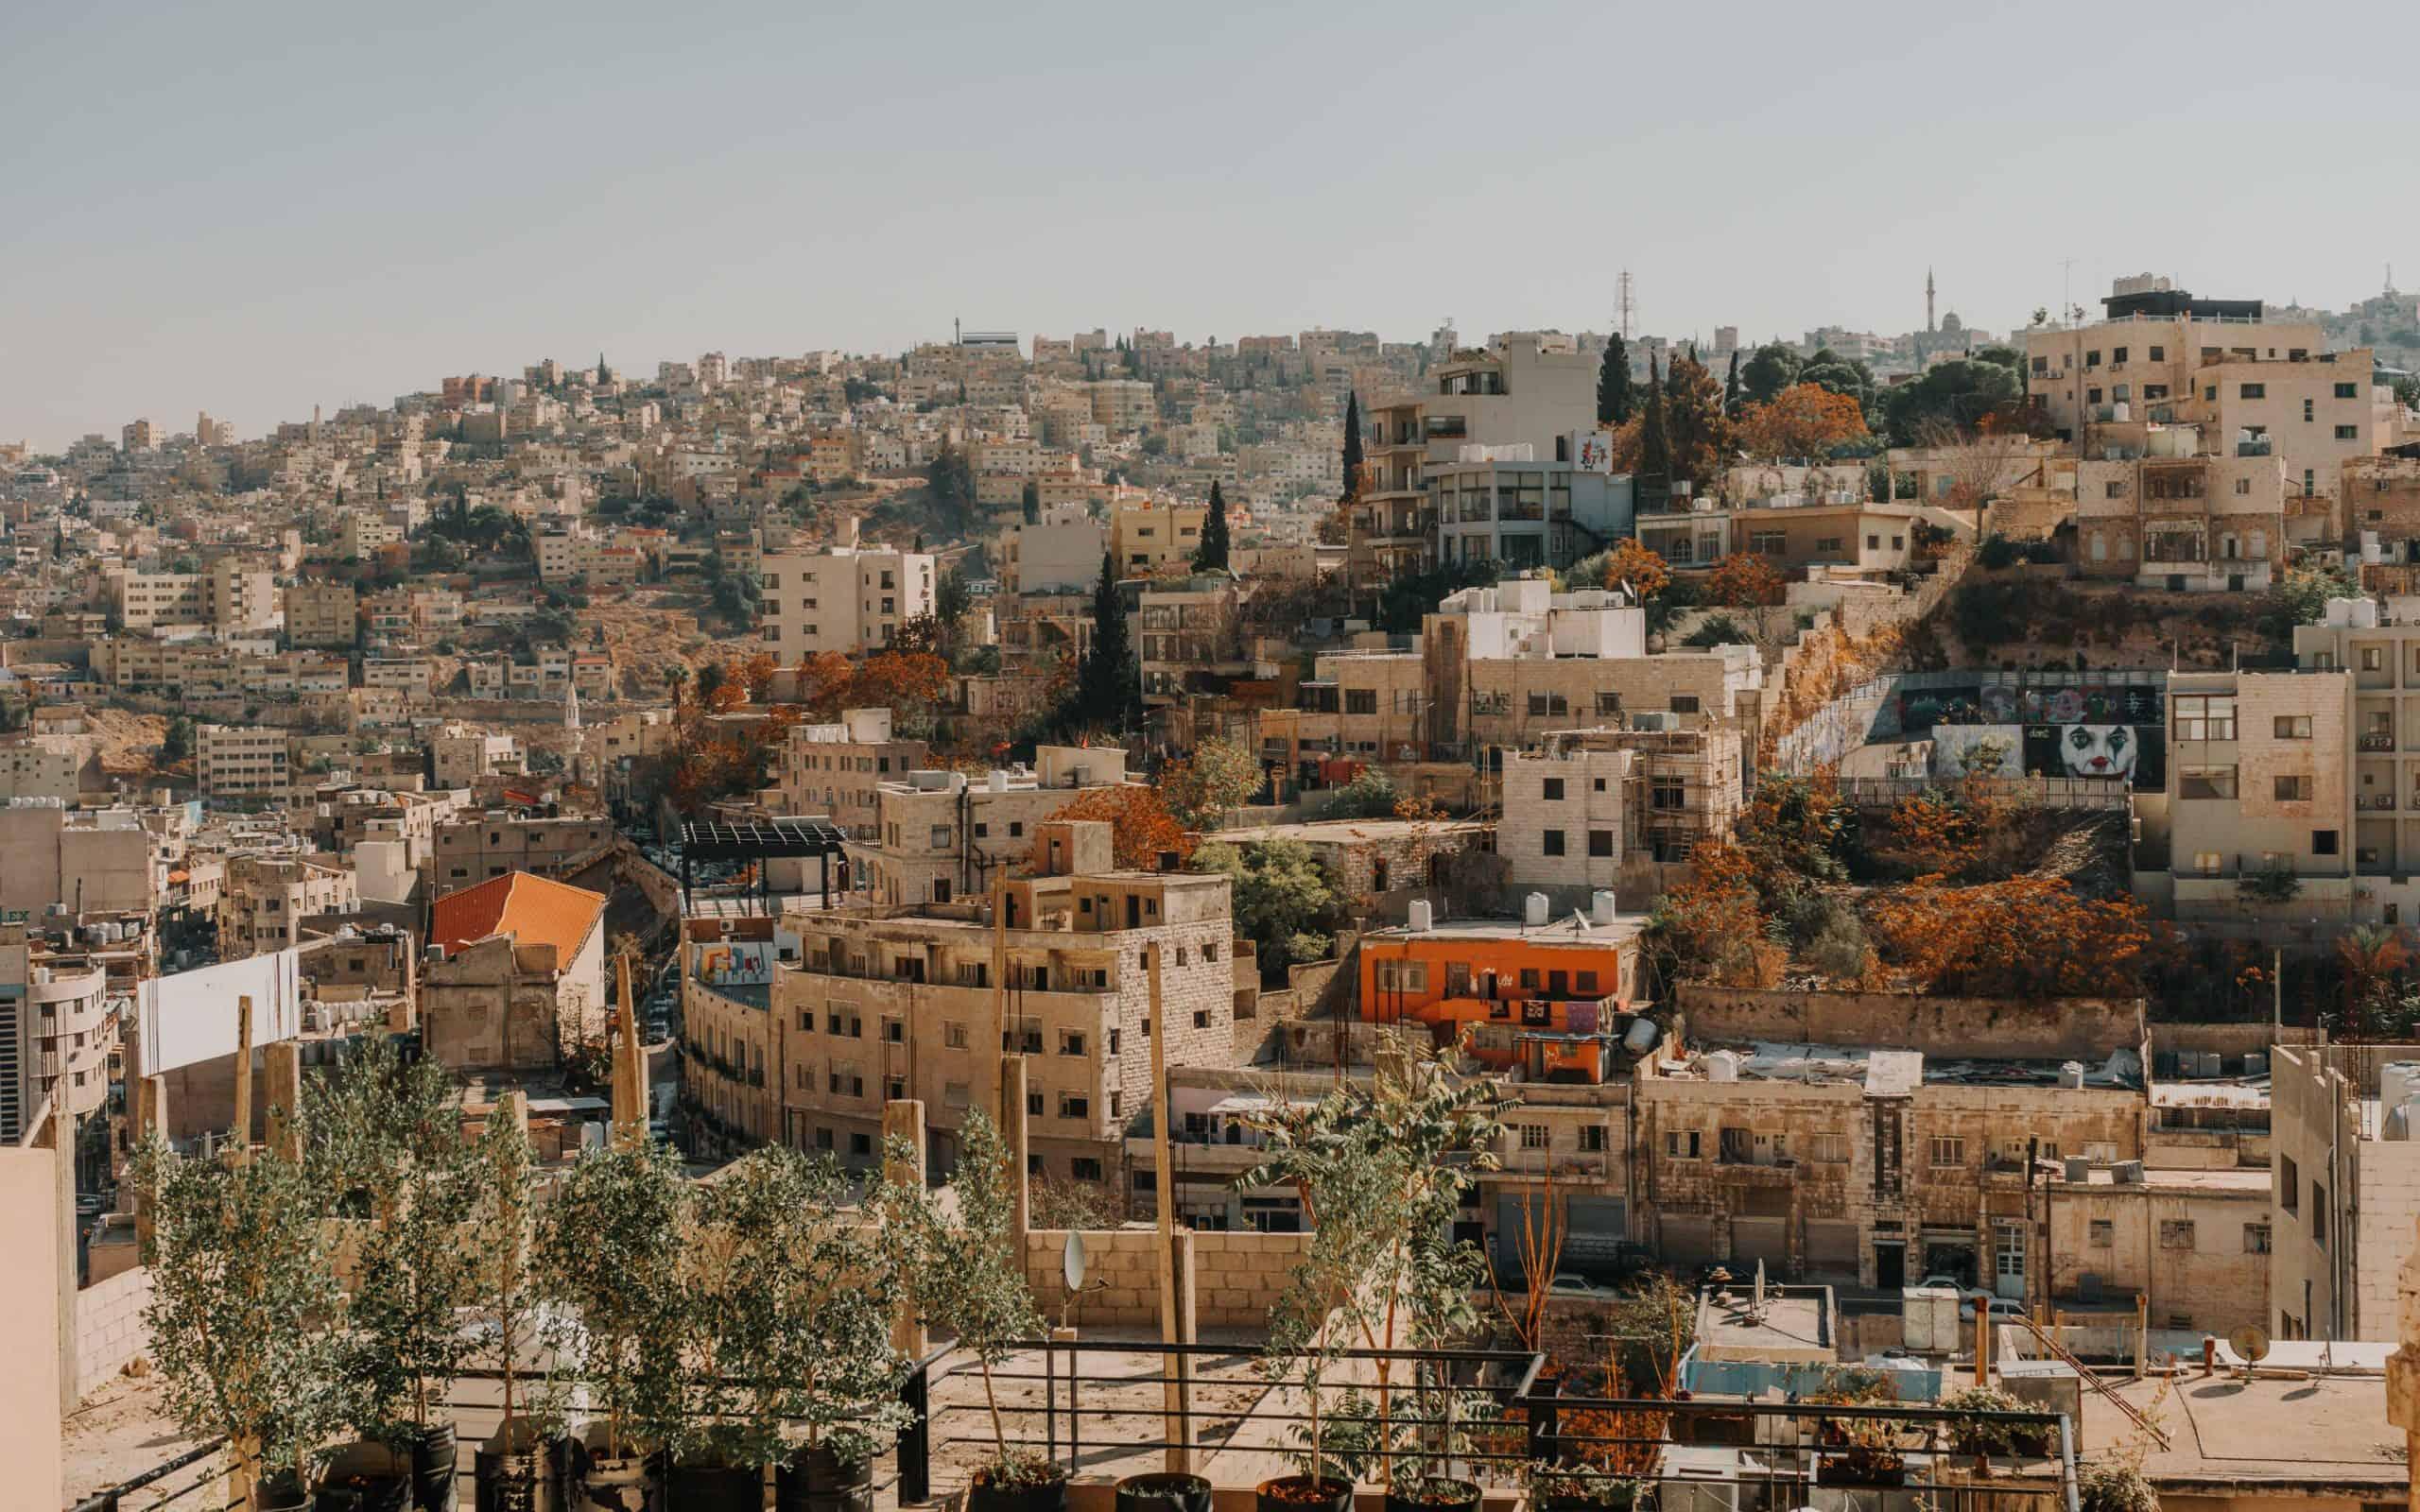 amman widok na miasto jordania przewodnik